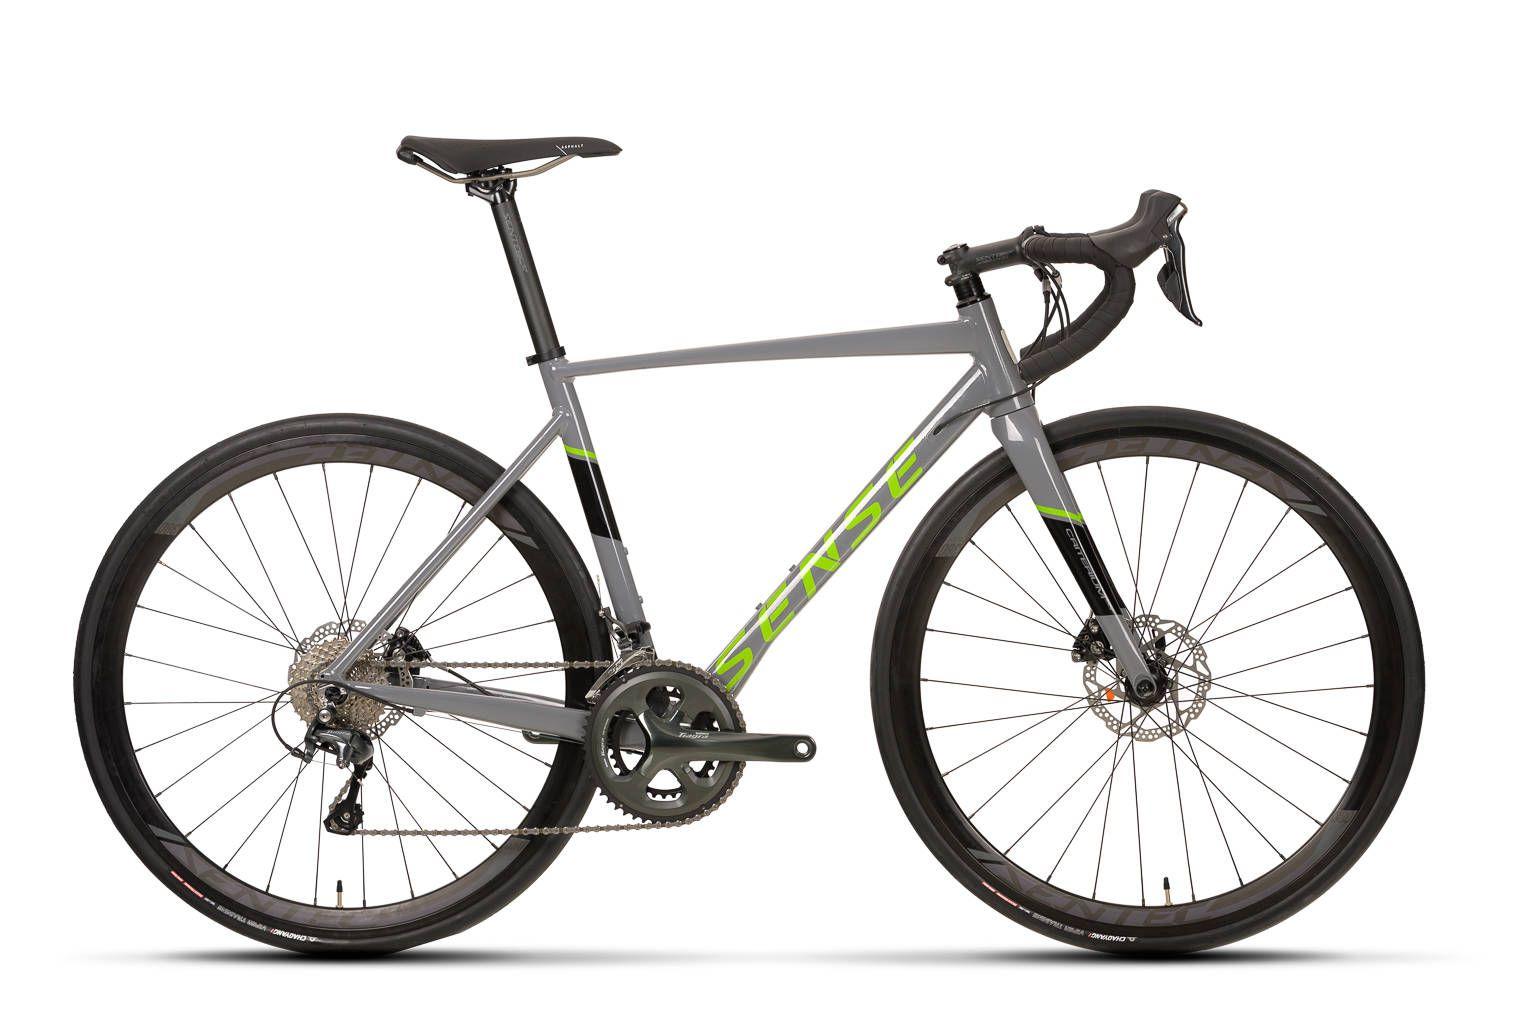 BICICLETA SPEED 700C SENSE CRITERIUM RACE 2020 - VERDE/CZA